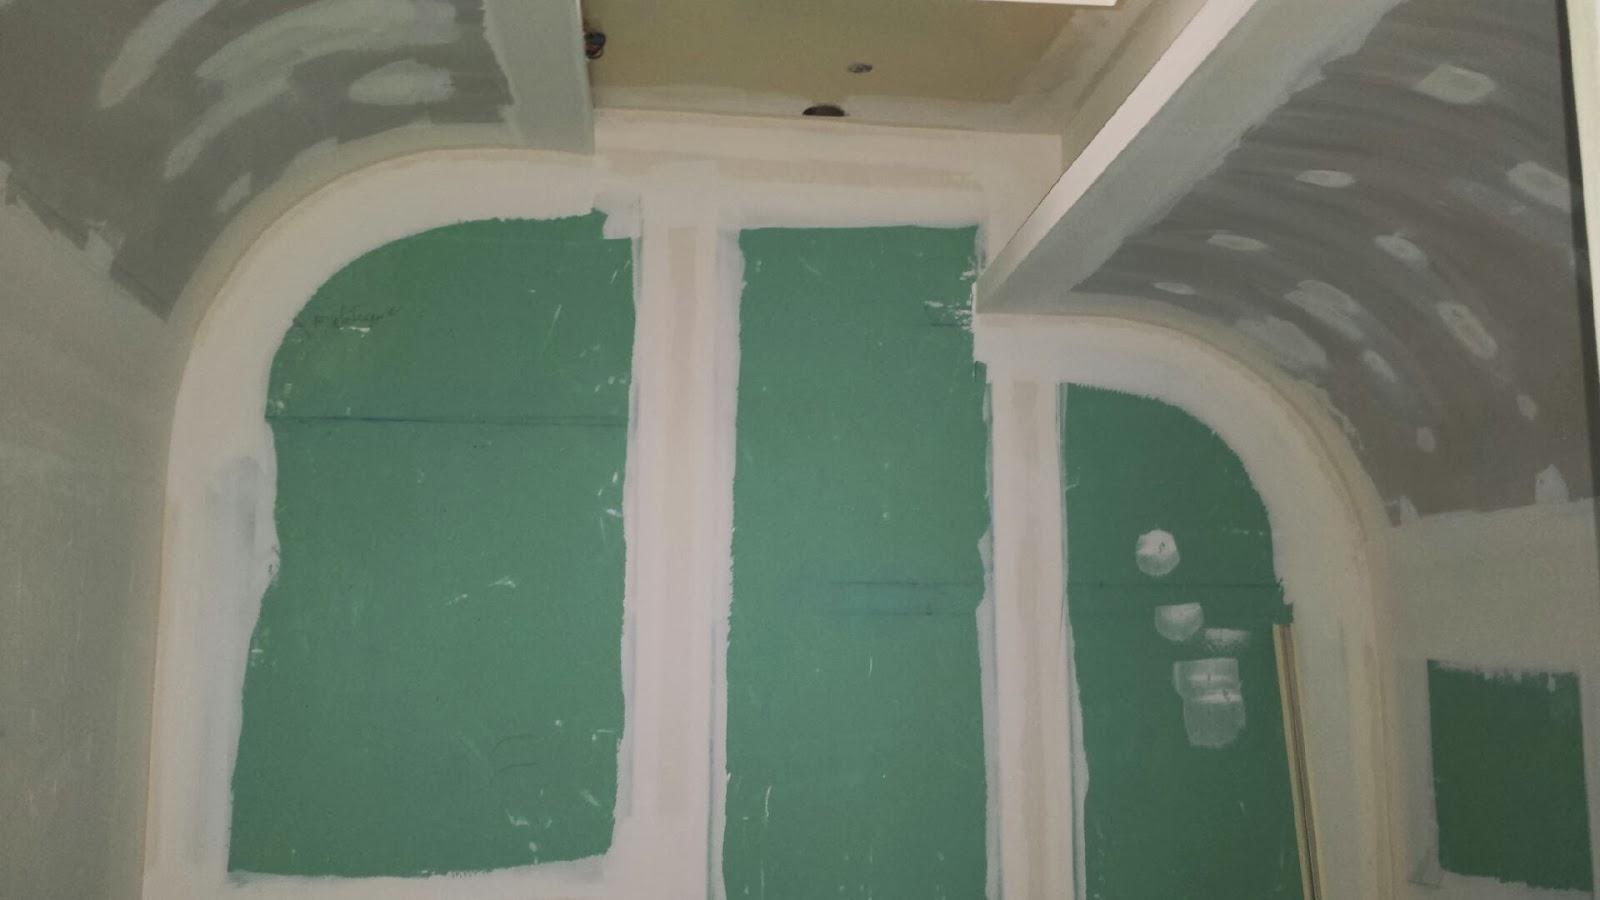 lcch plafond angle arrondi pour salle de bain disign. Black Bedroom Furniture Sets. Home Design Ideas